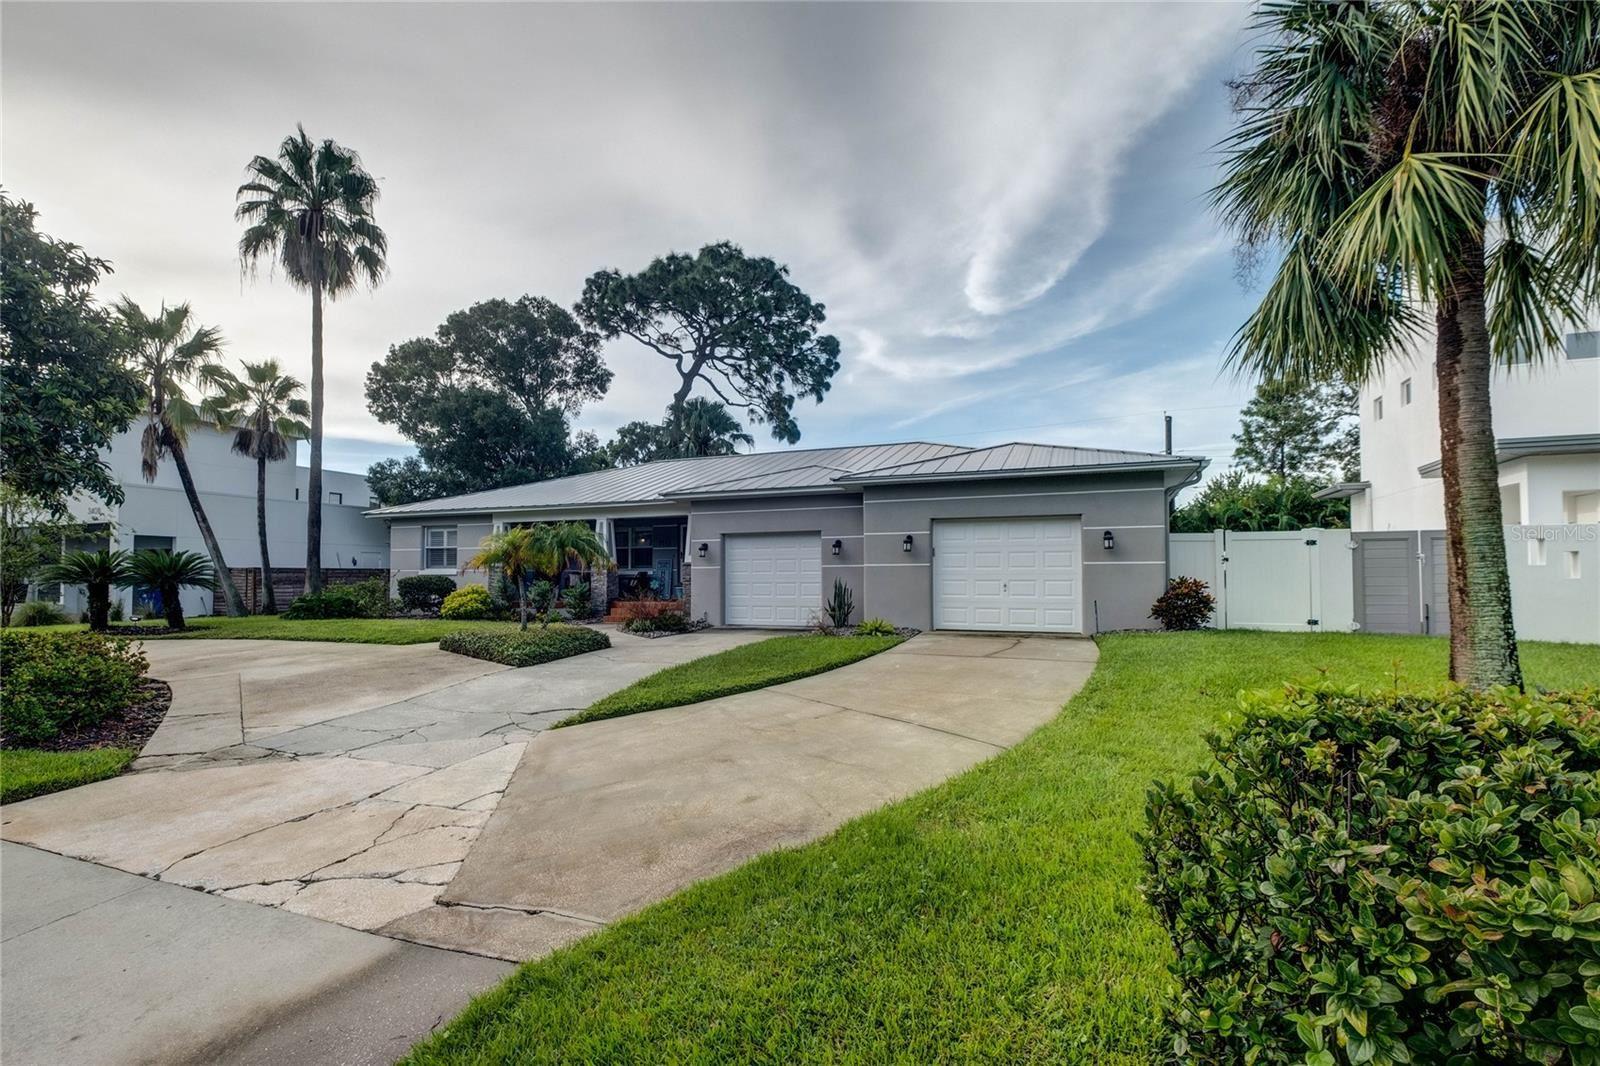 3412 W EL PRADO BOULEVARD, Tampa, FL 33629 - #: T3330629